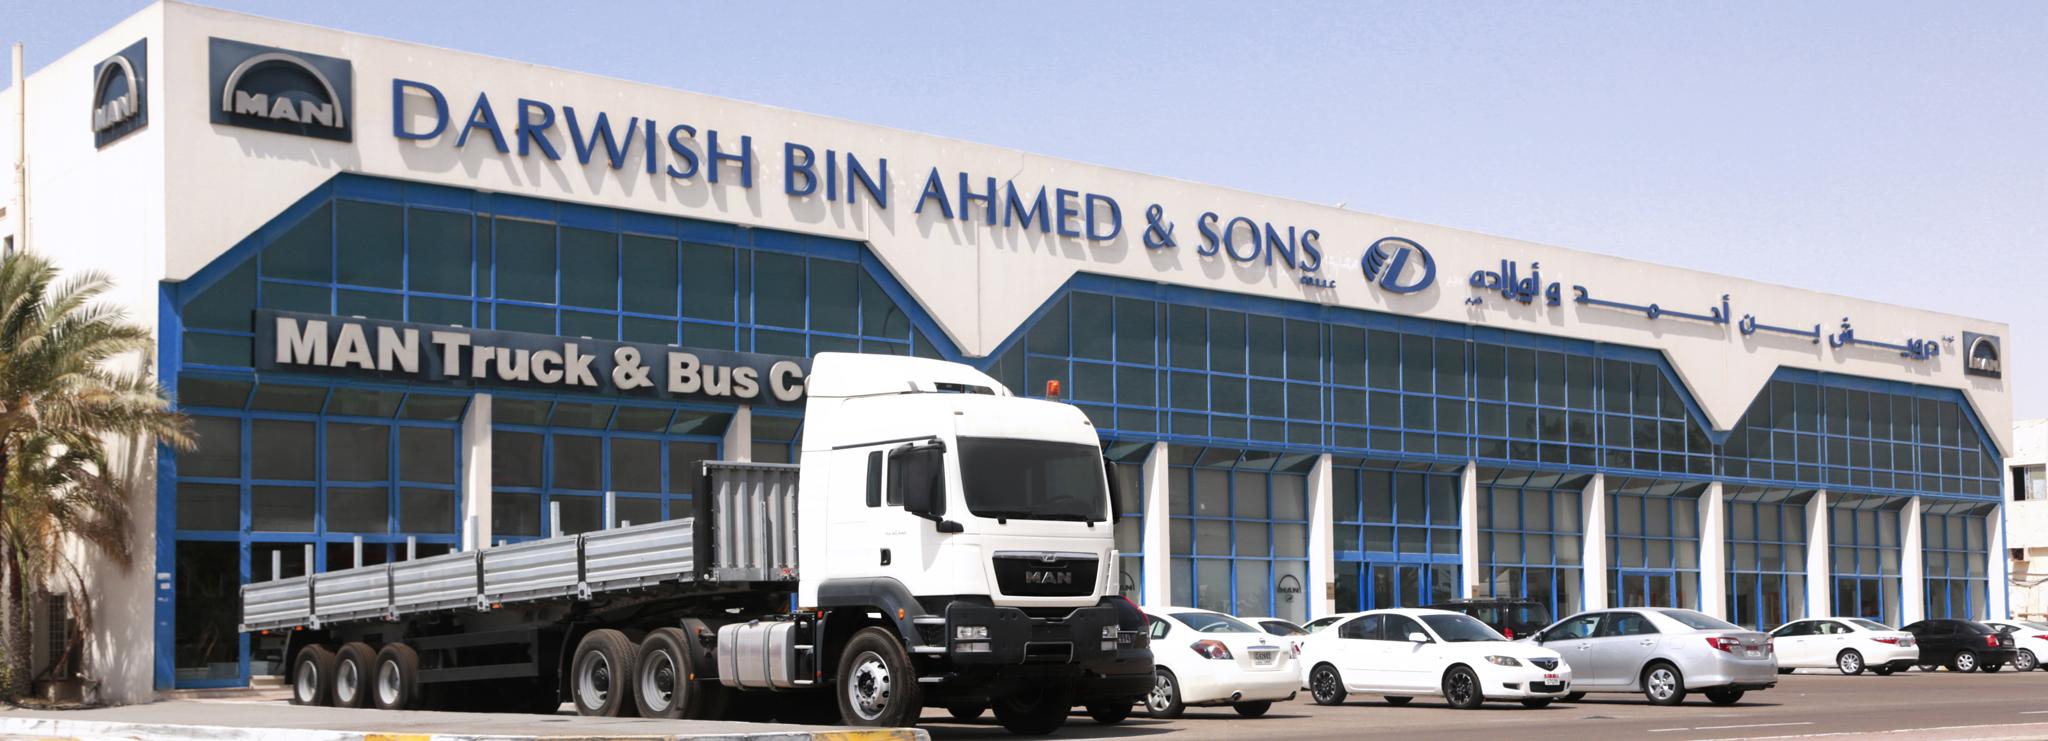 Authorized Dealership Darwish Bin Ahmed Amp Sons Co Llc